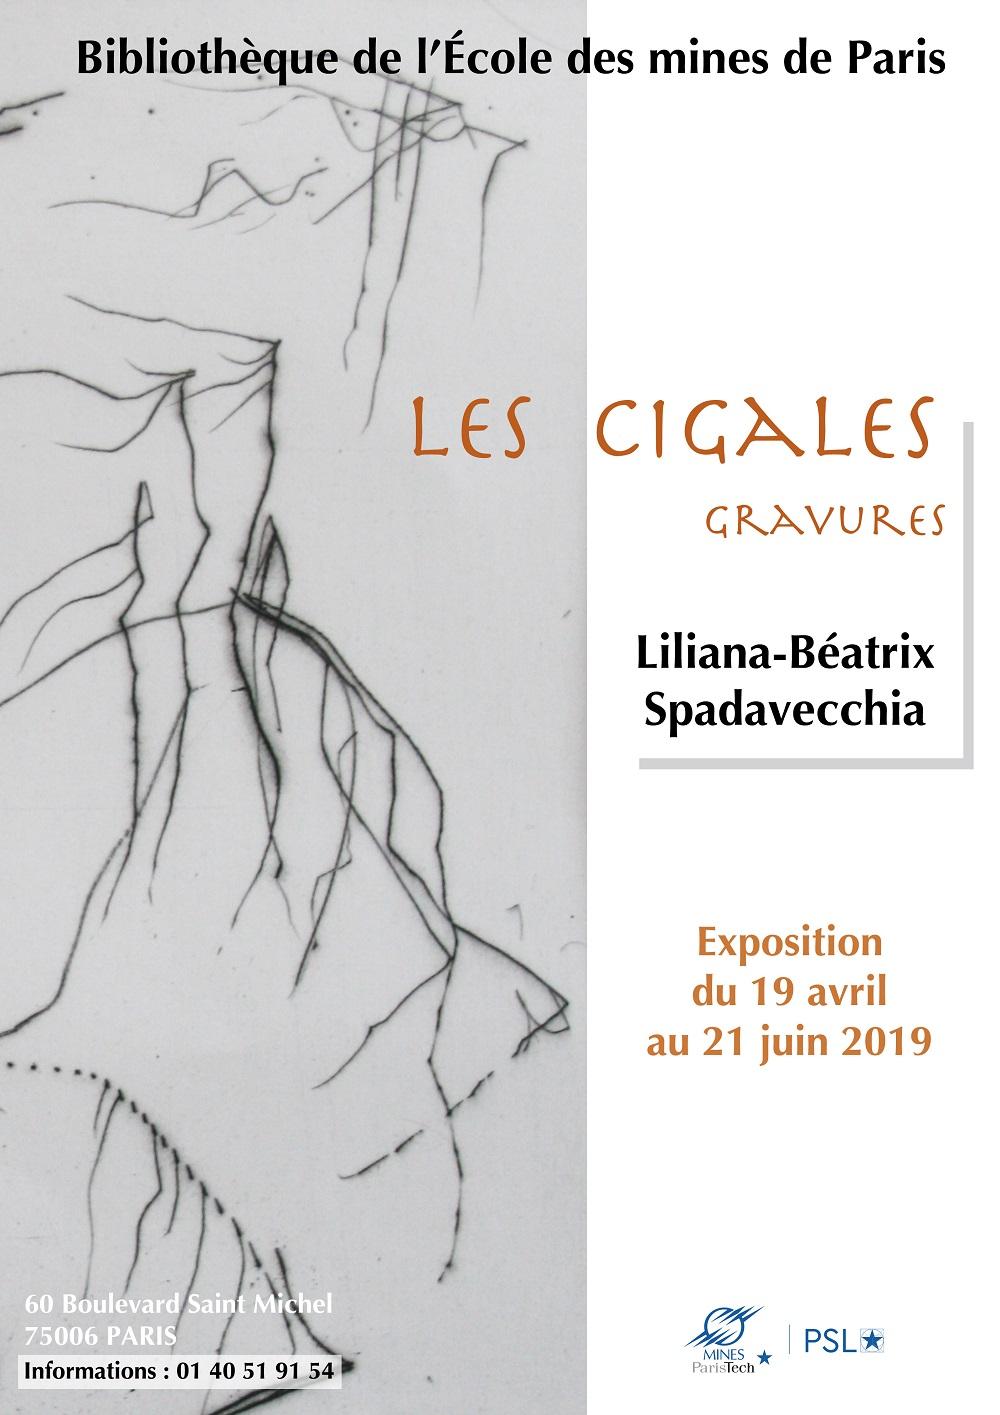 Les Cigales - Exposition de Liliana-Béatrix Spadavecchia